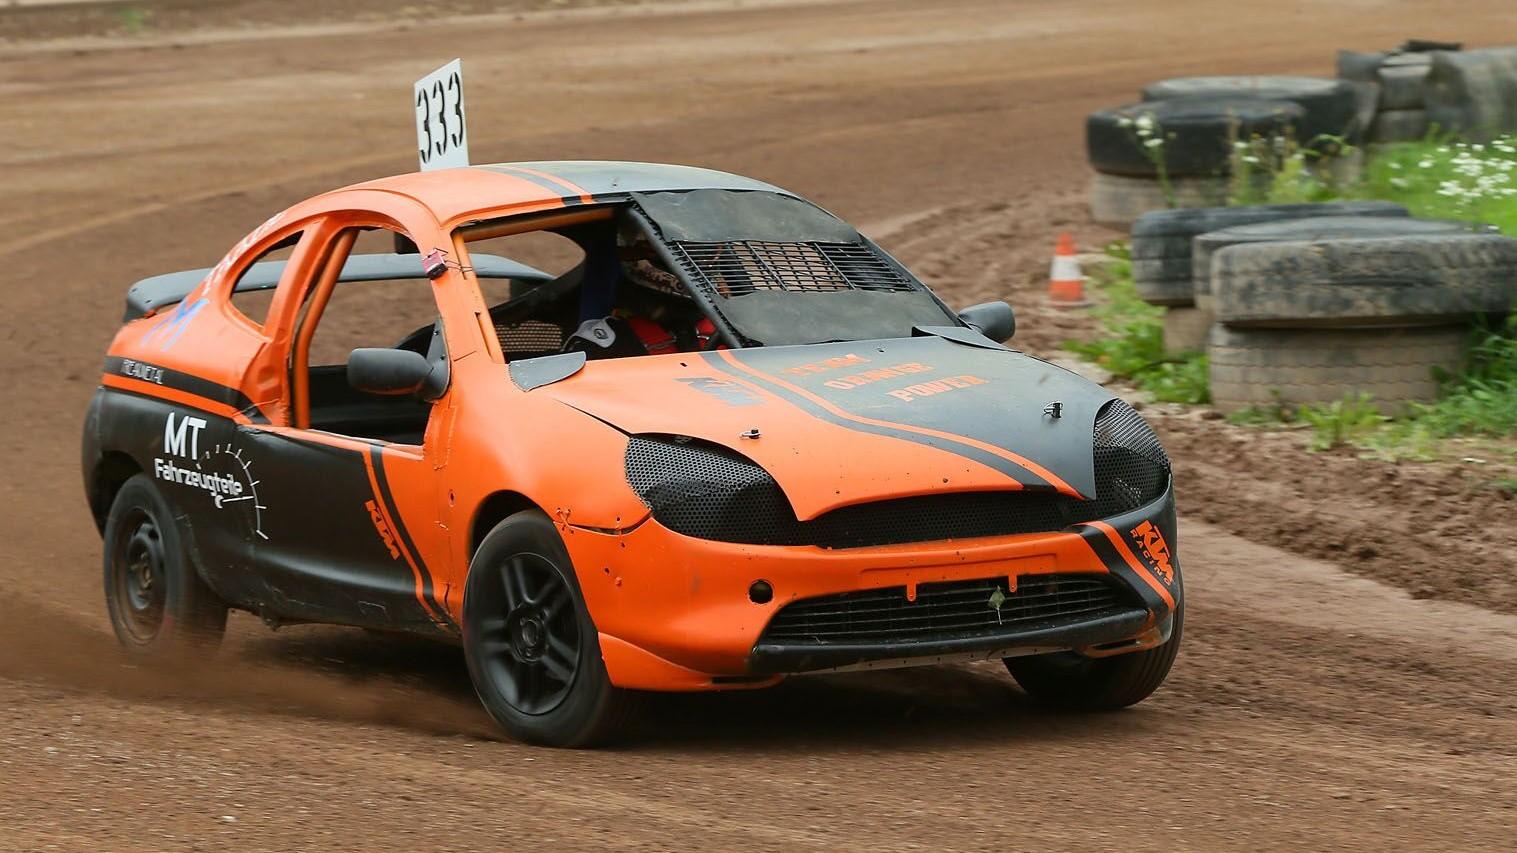 Stockcar Racing Cup 2019: Anpfiff zur neuen Titeljagd